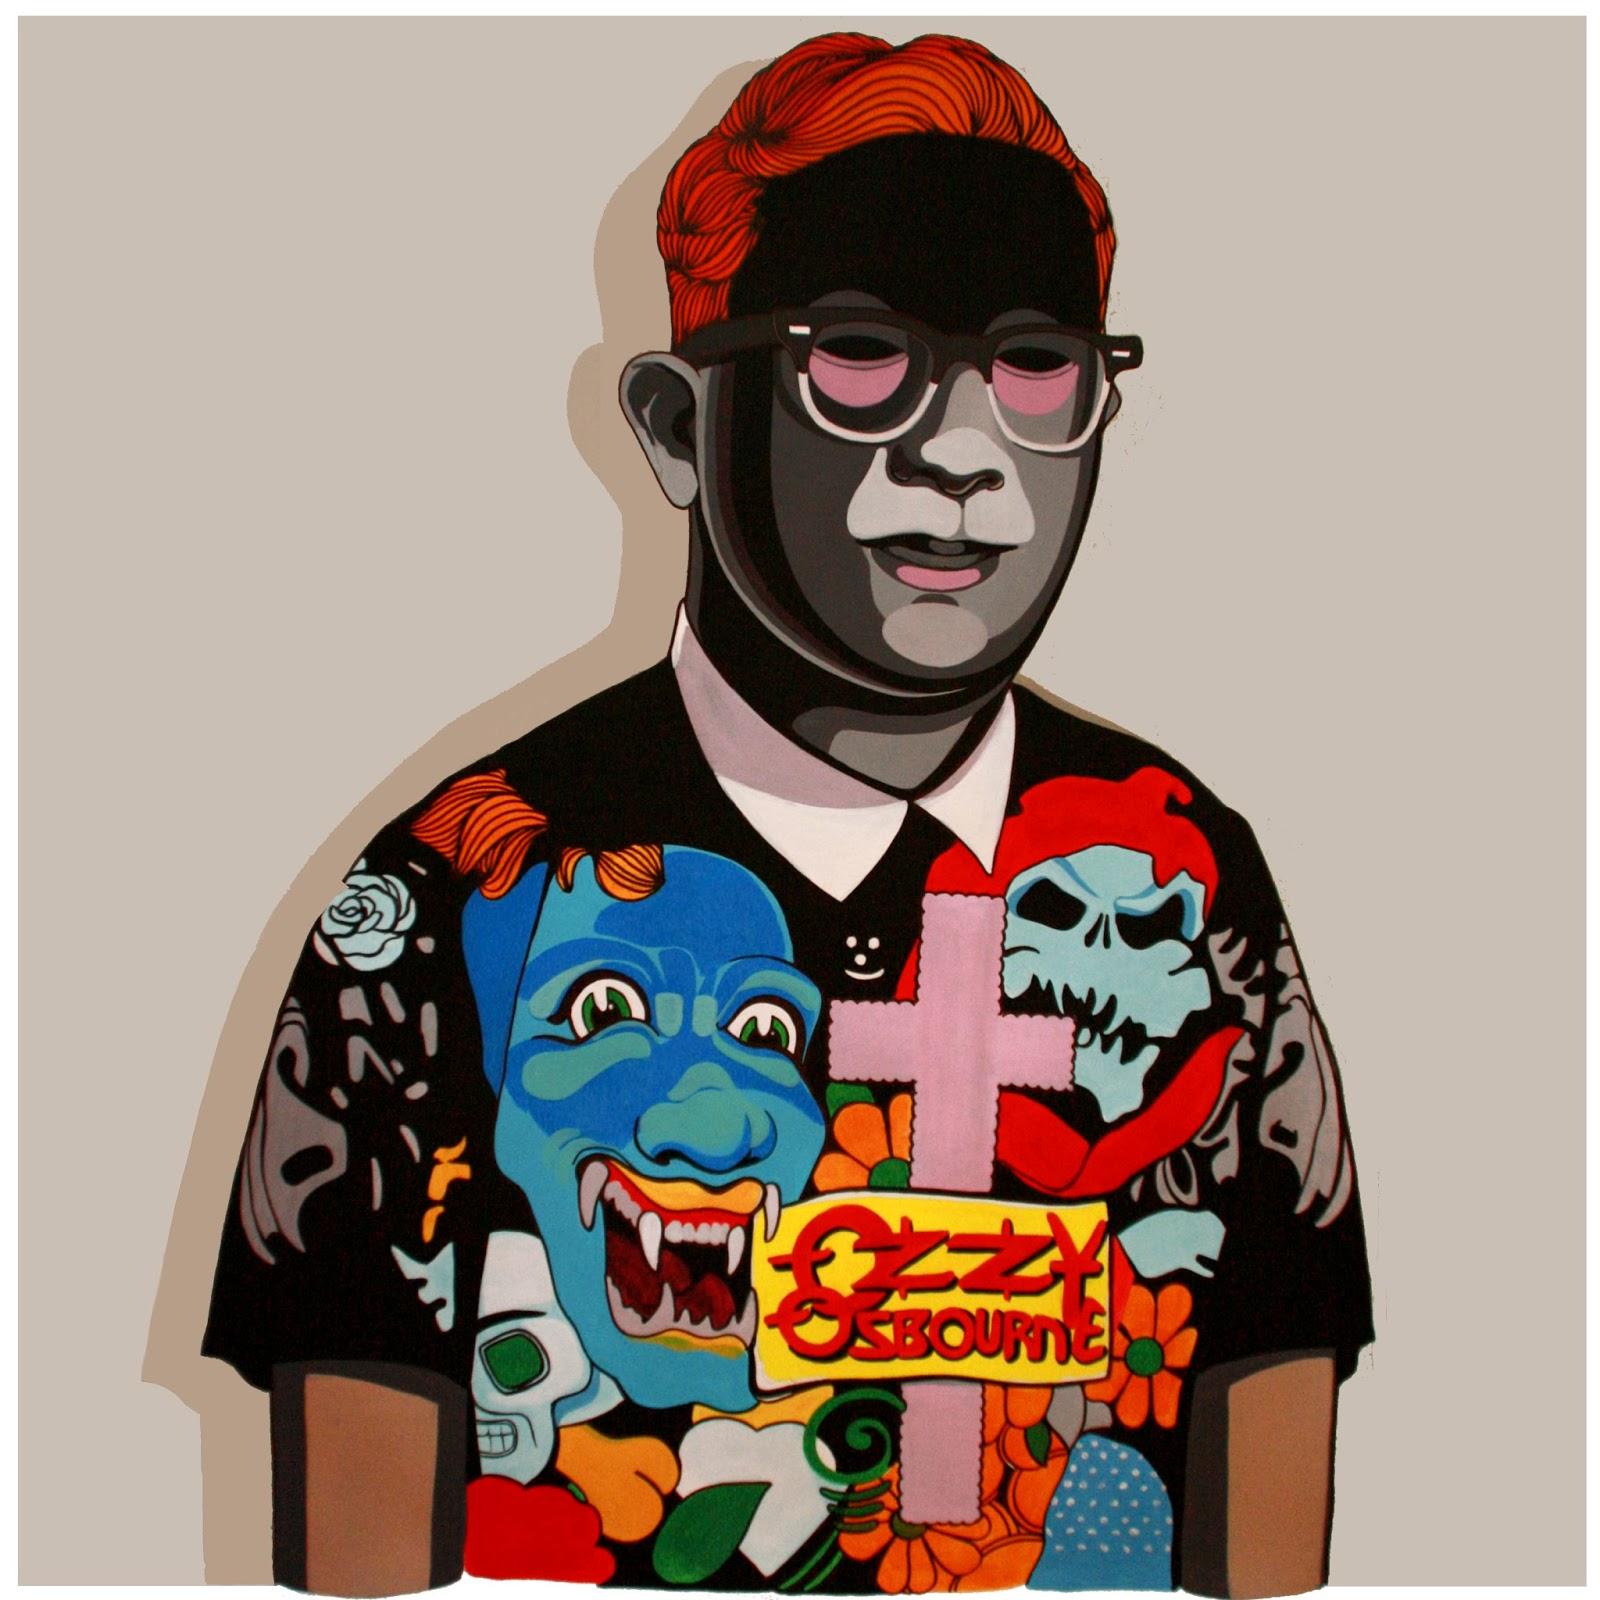 José Álvarez, José Álvarez Ilustración, Ozzy Osbourne,